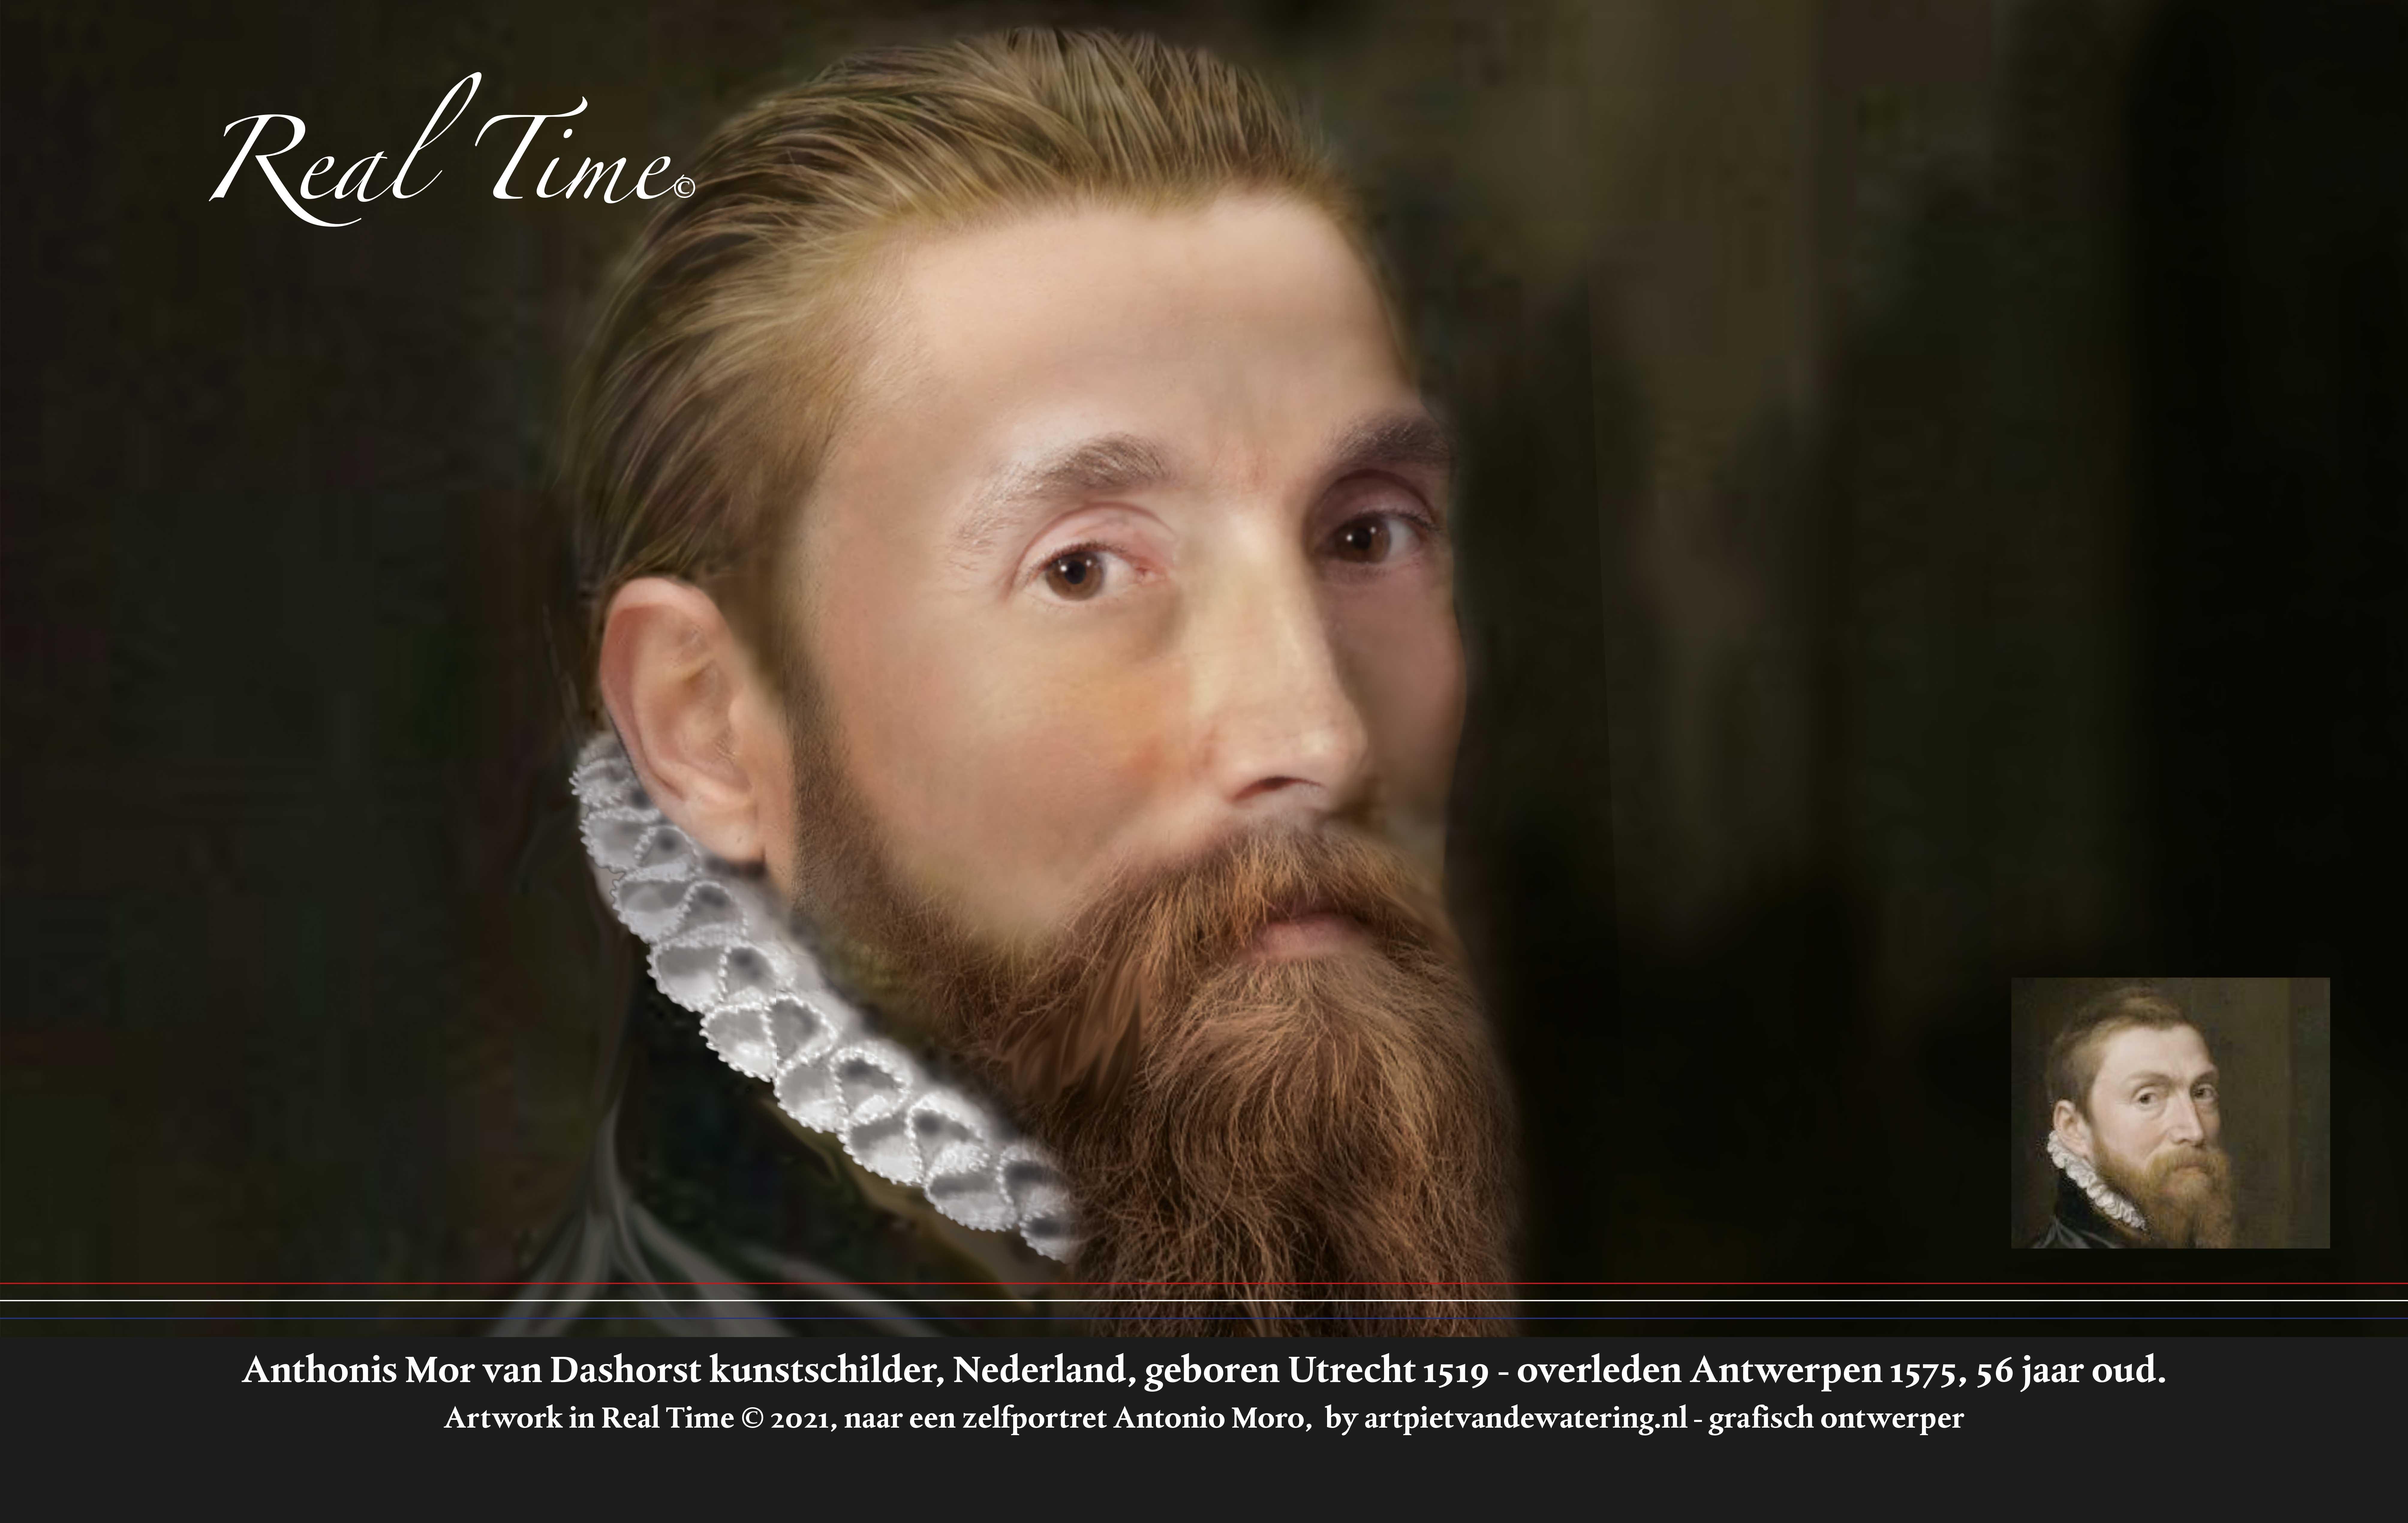 Anth-Mor-van-Dashorst-1519-1575